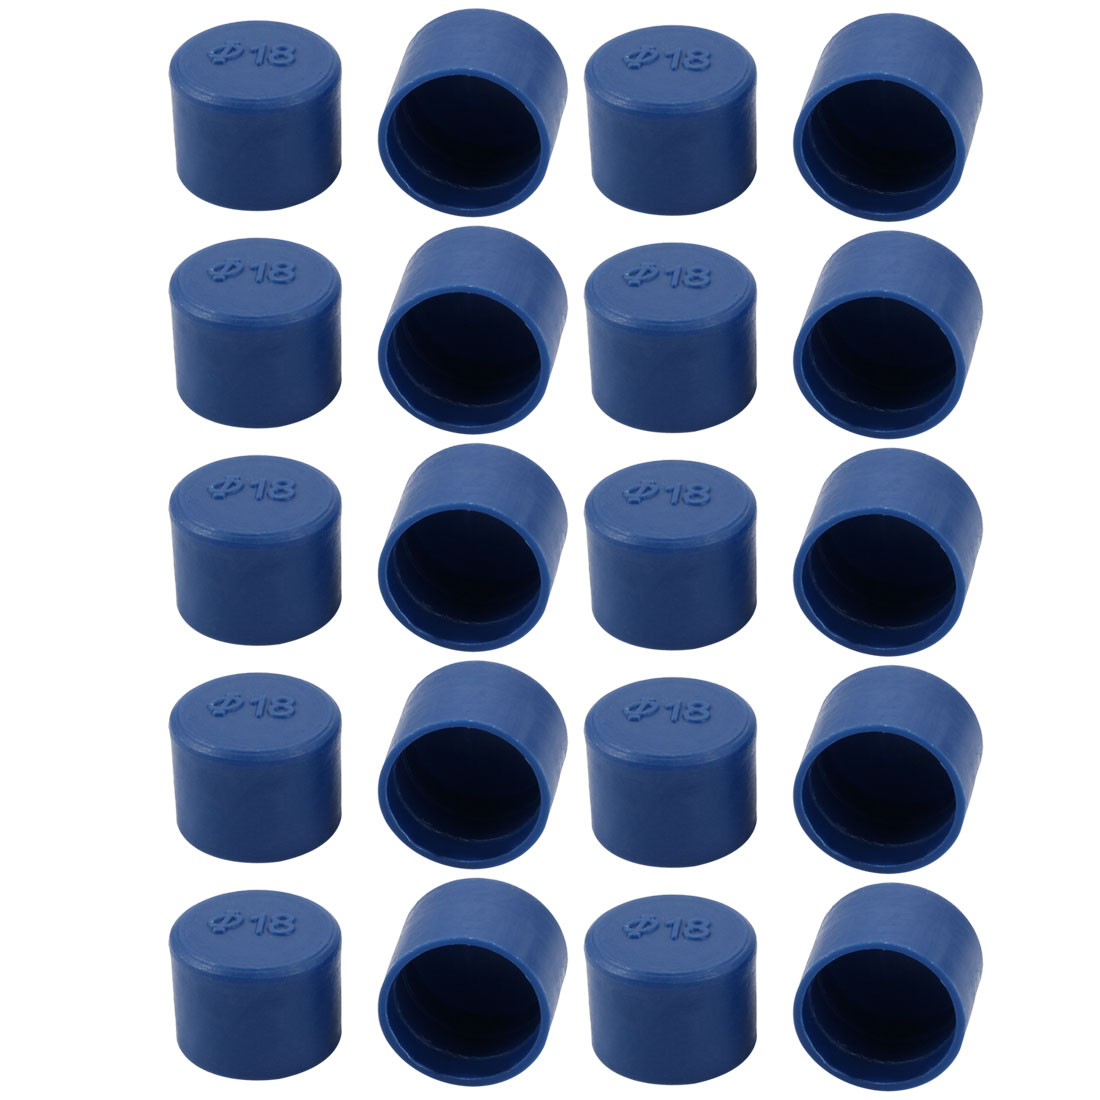 20pcs 18mm Inner Dia PE Plastic End Cap Bolt Thread Protector Tube Cover Blue